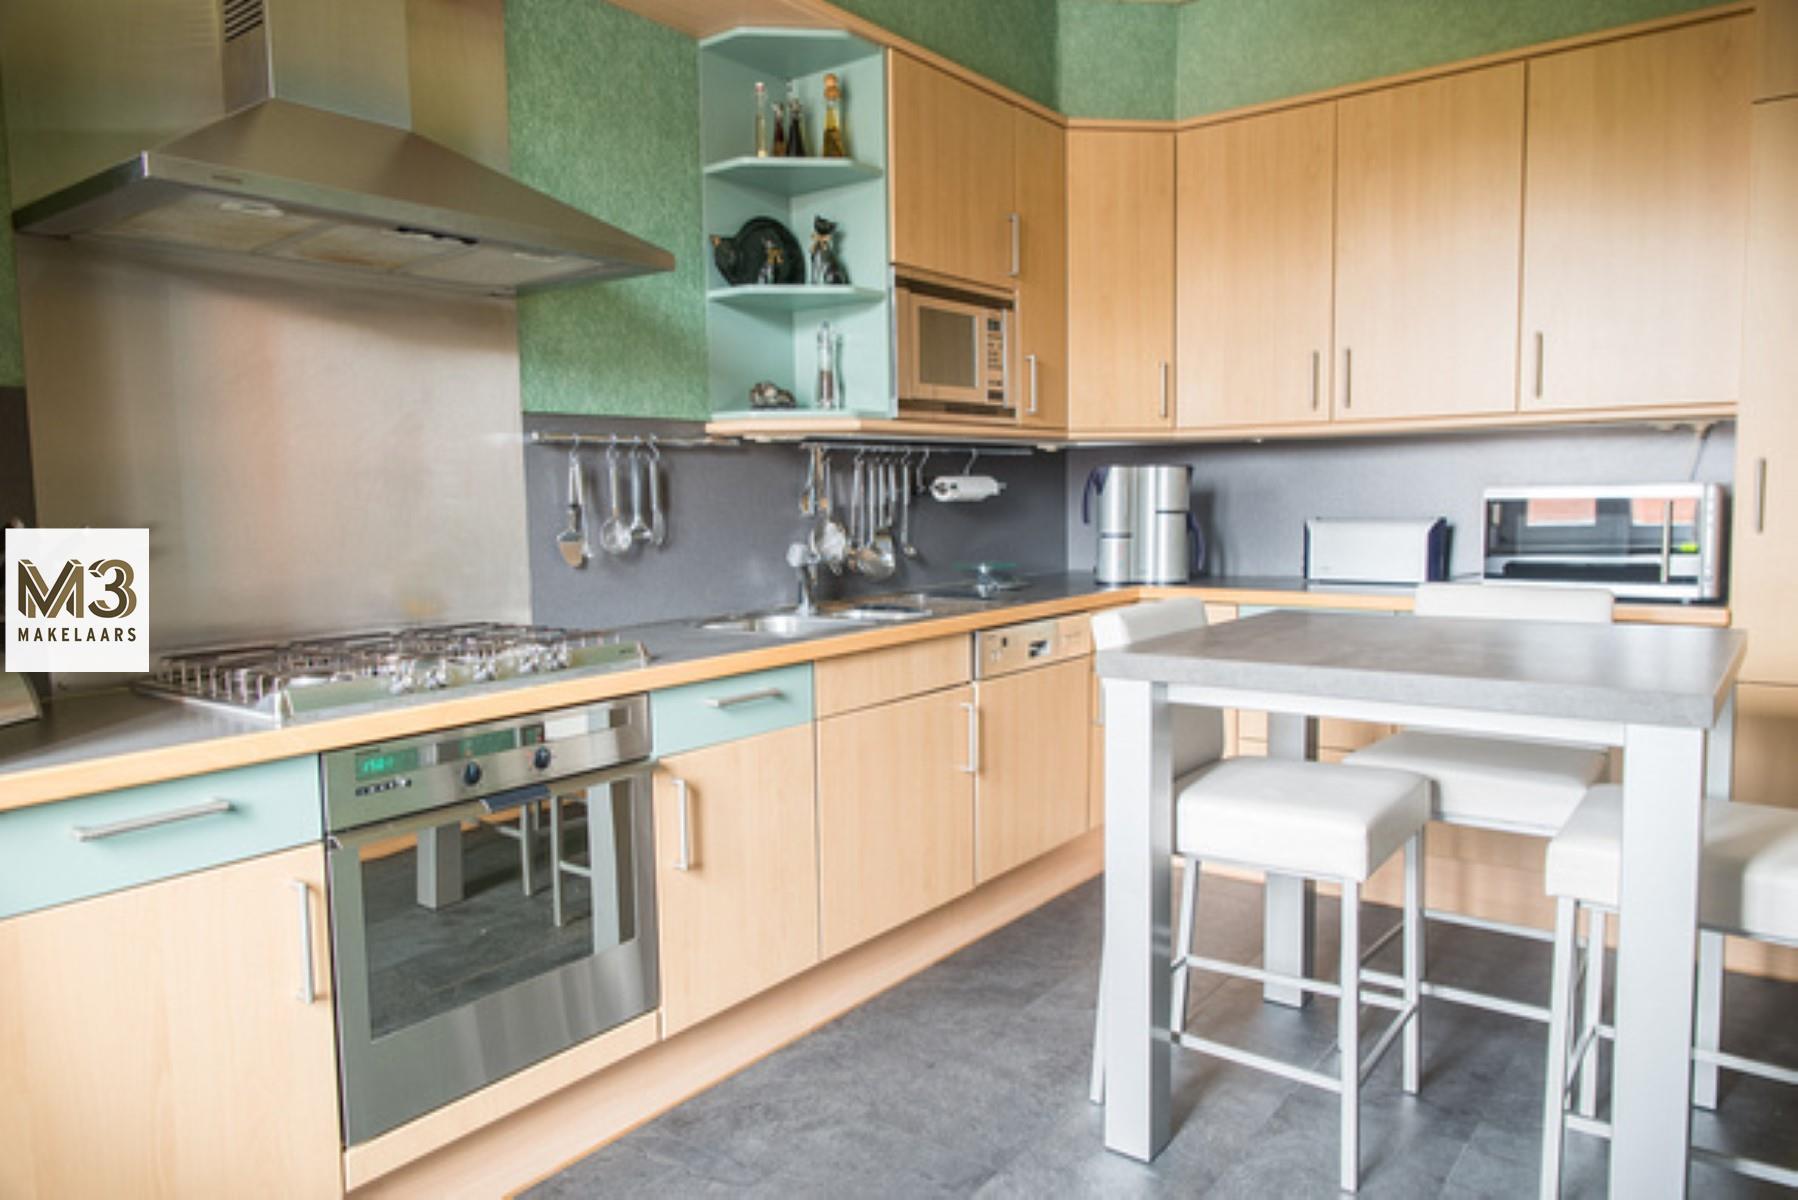 Handels/woonhuis met garage en tuin